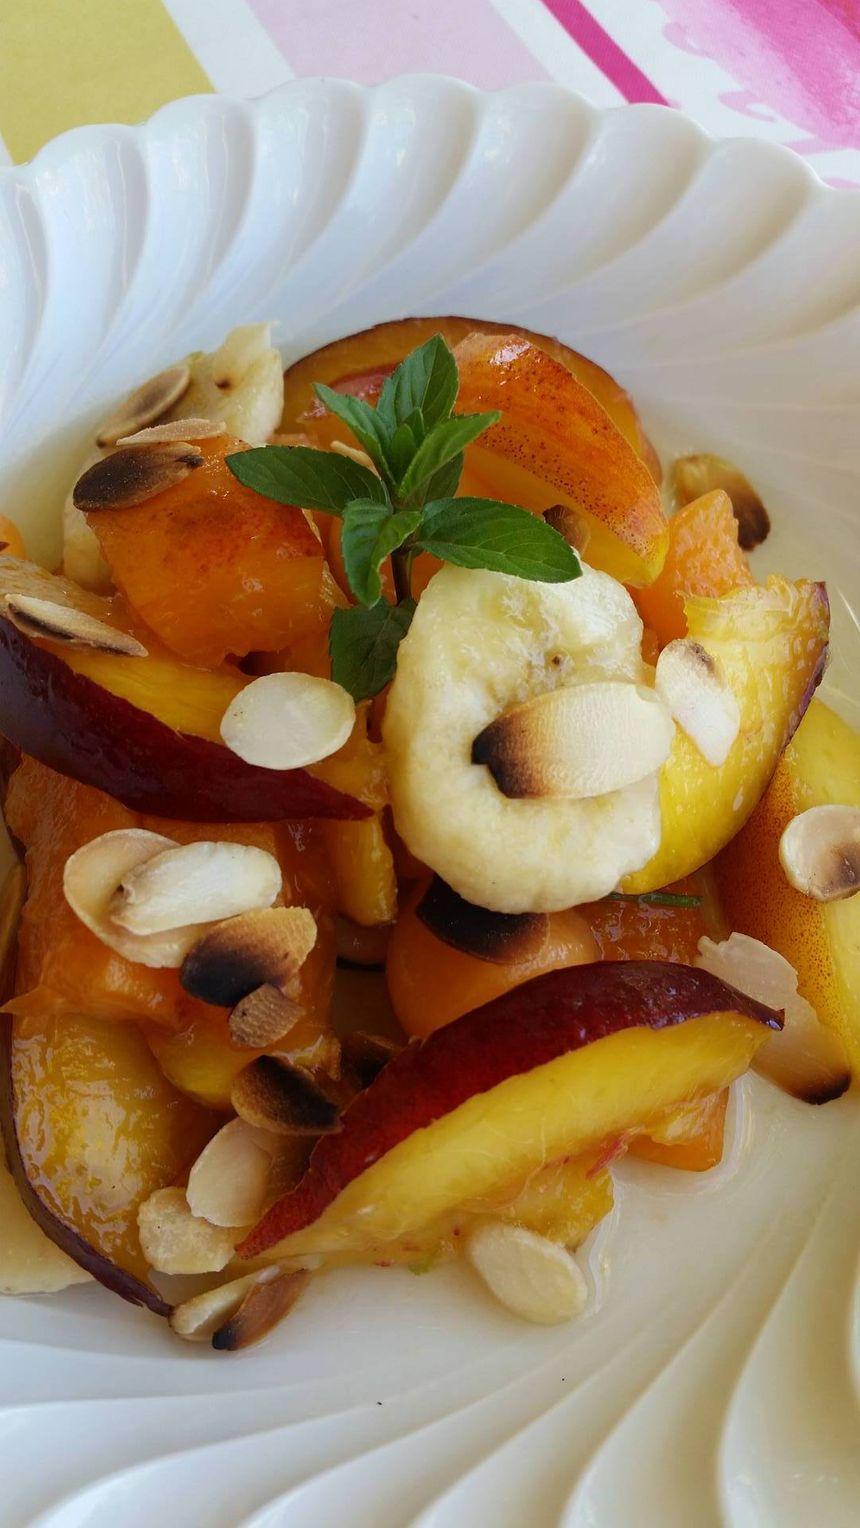 Salade de fruits d'été - Aucun(e)